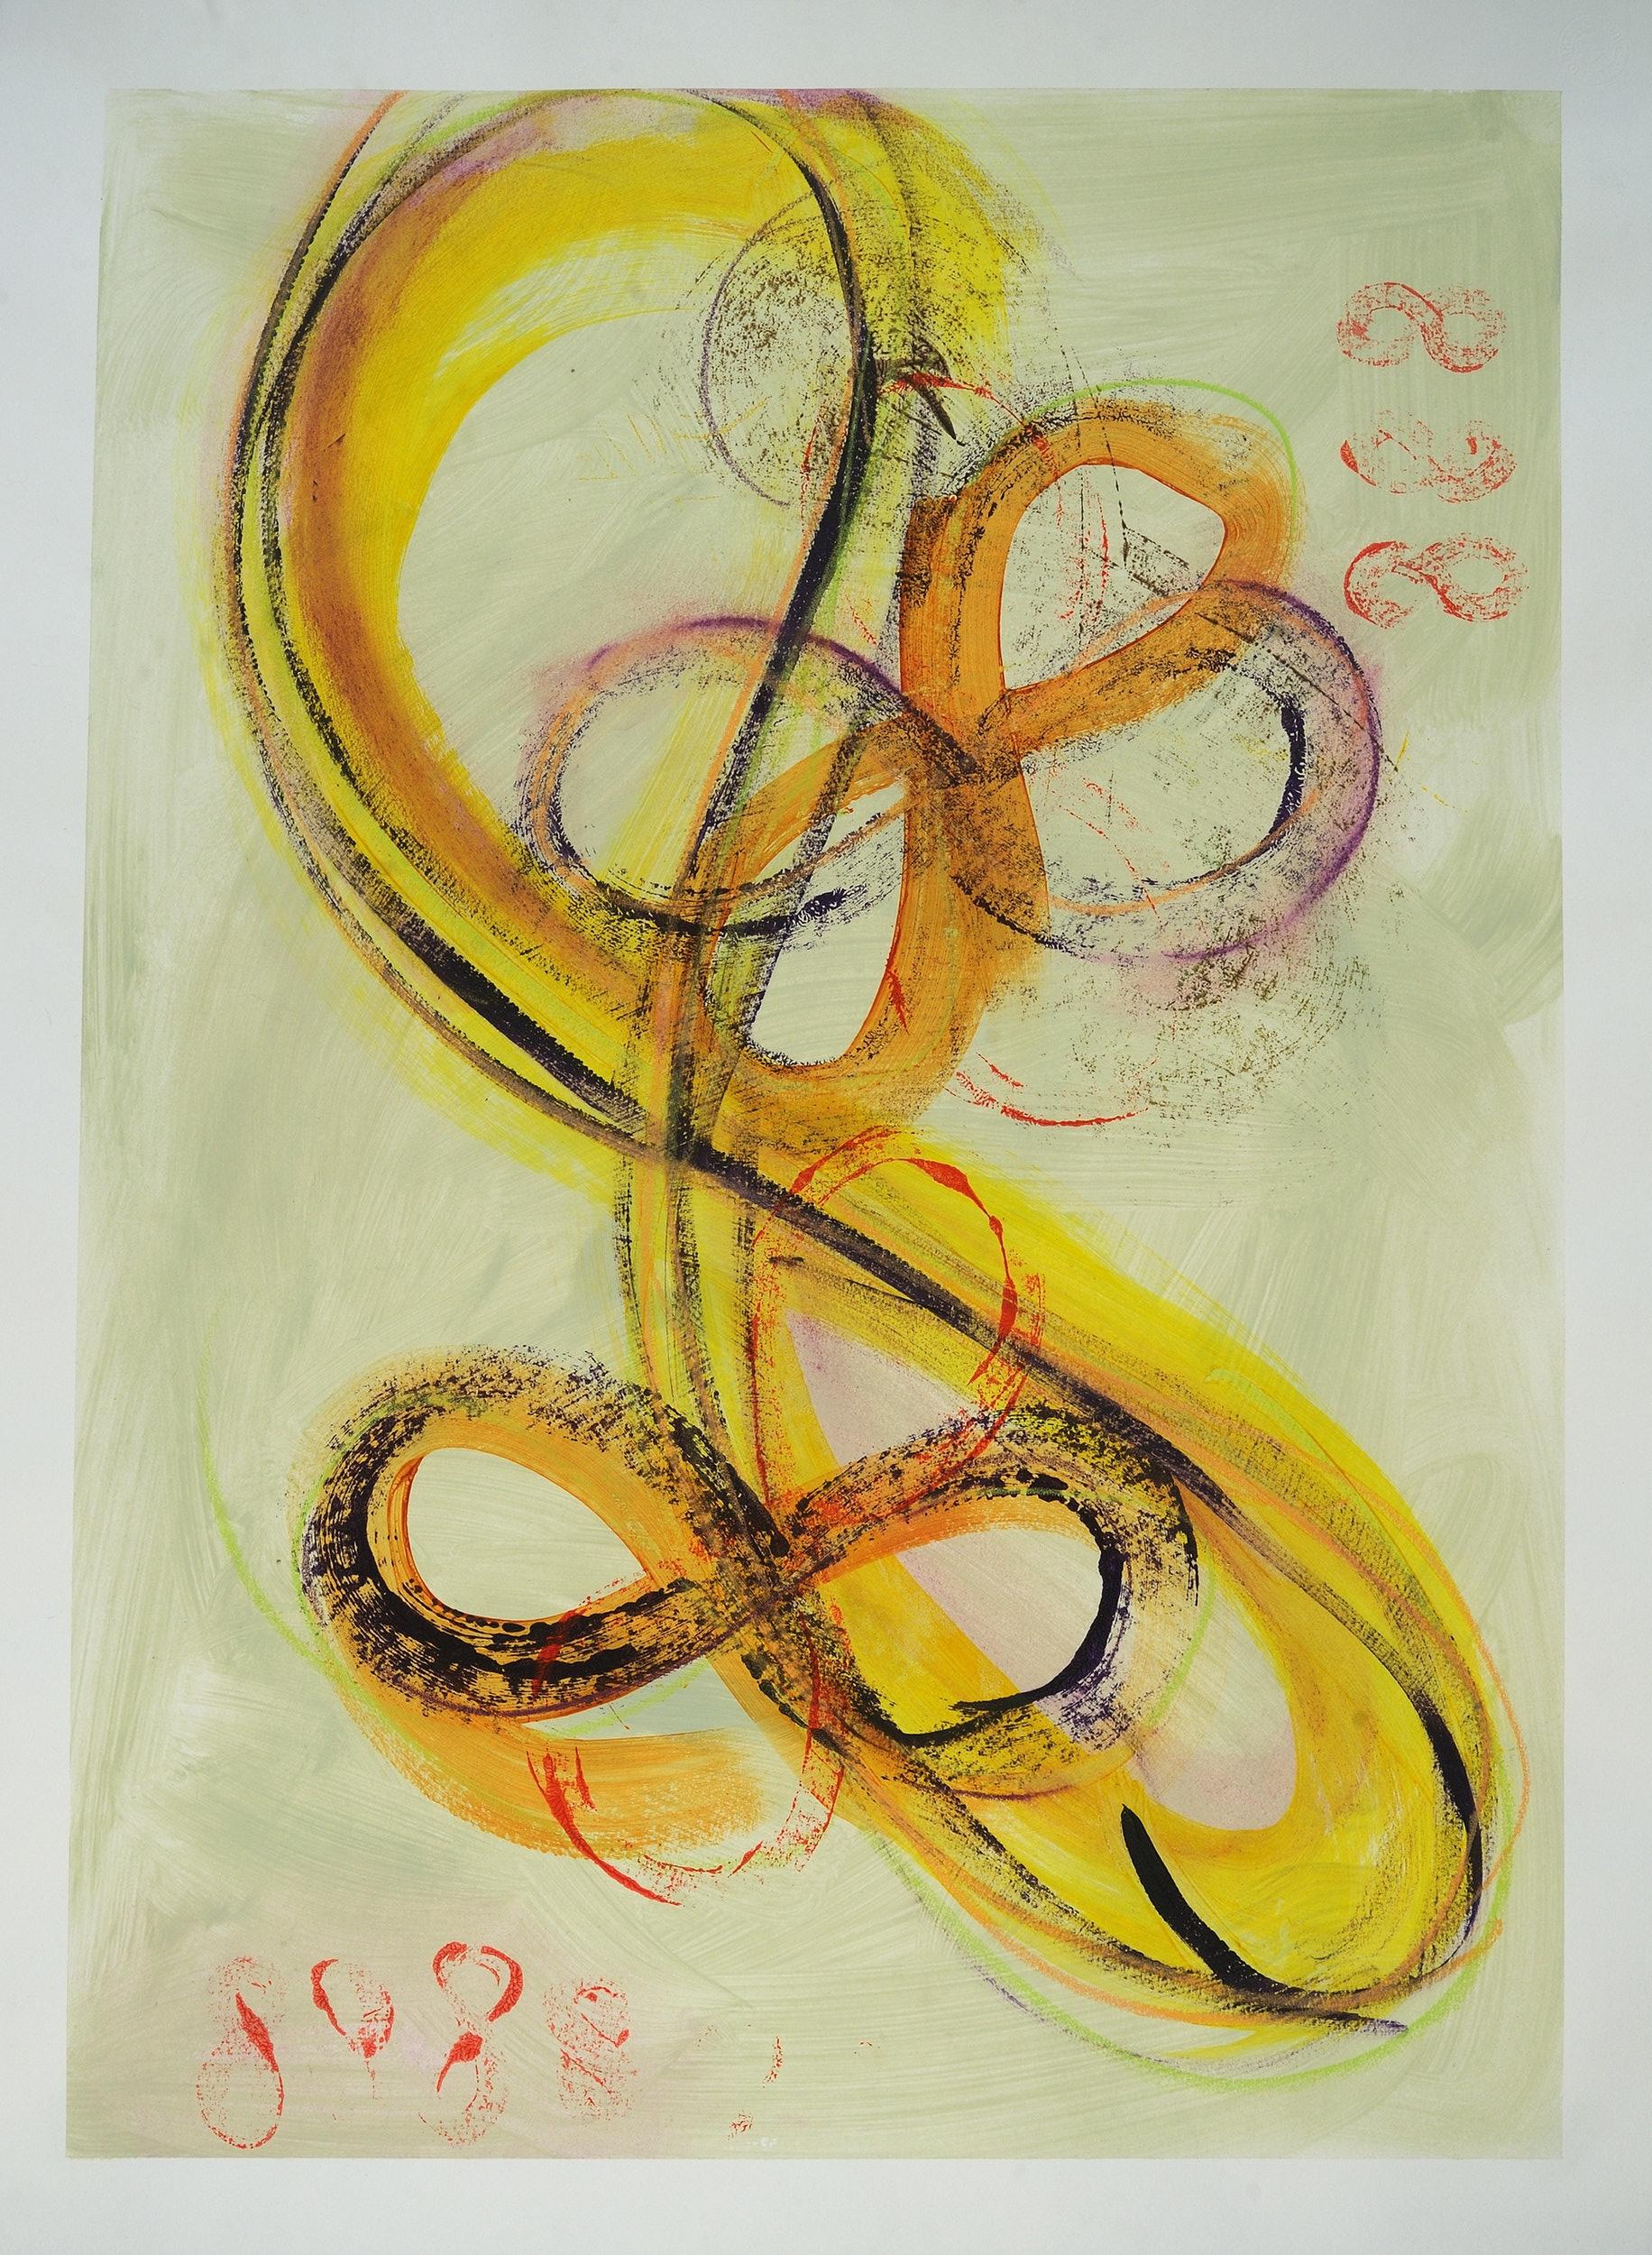 lifting flying ~ i am shifting - infinity series by Karin Edgett